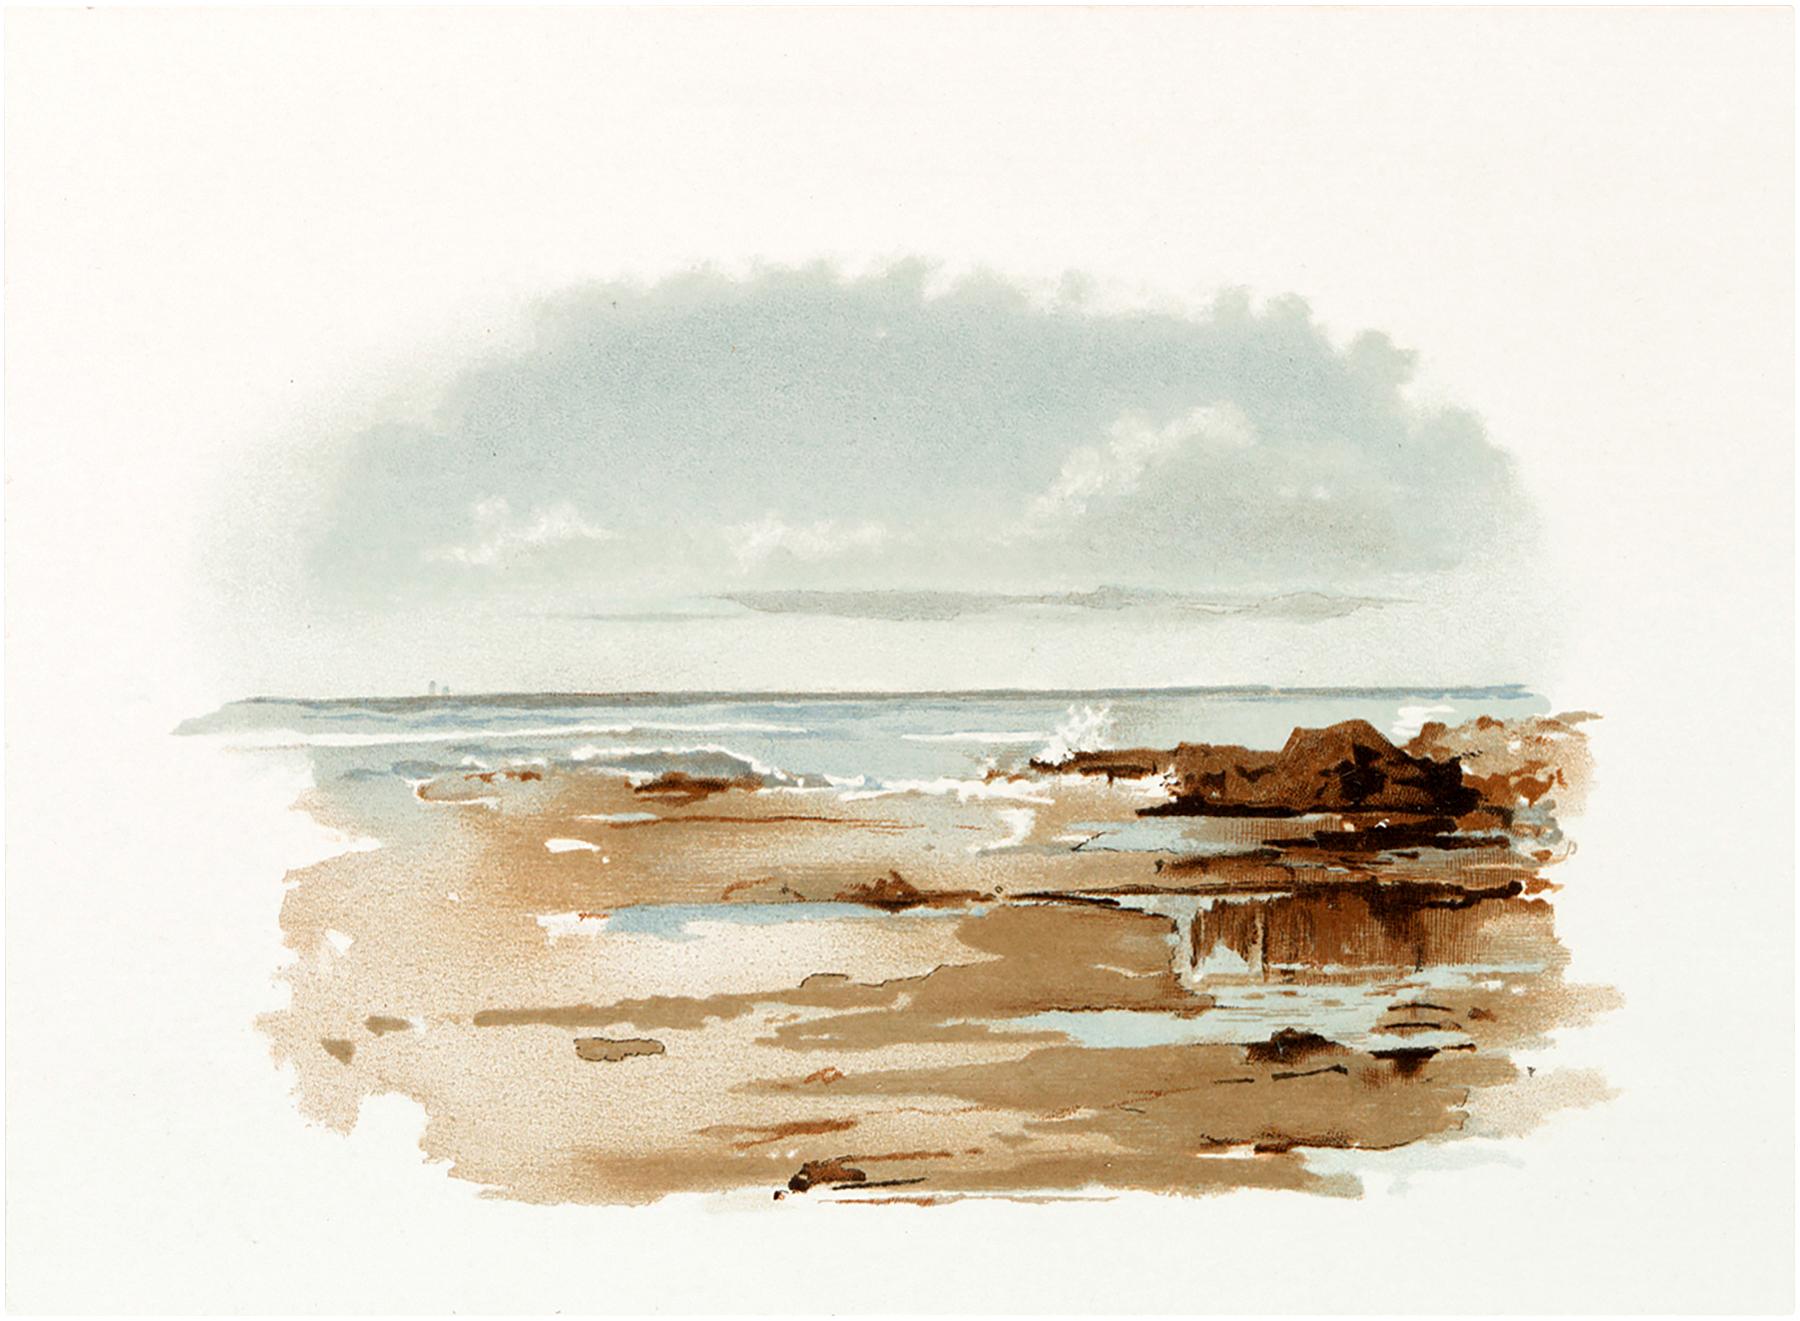 Vintage Seascape Image